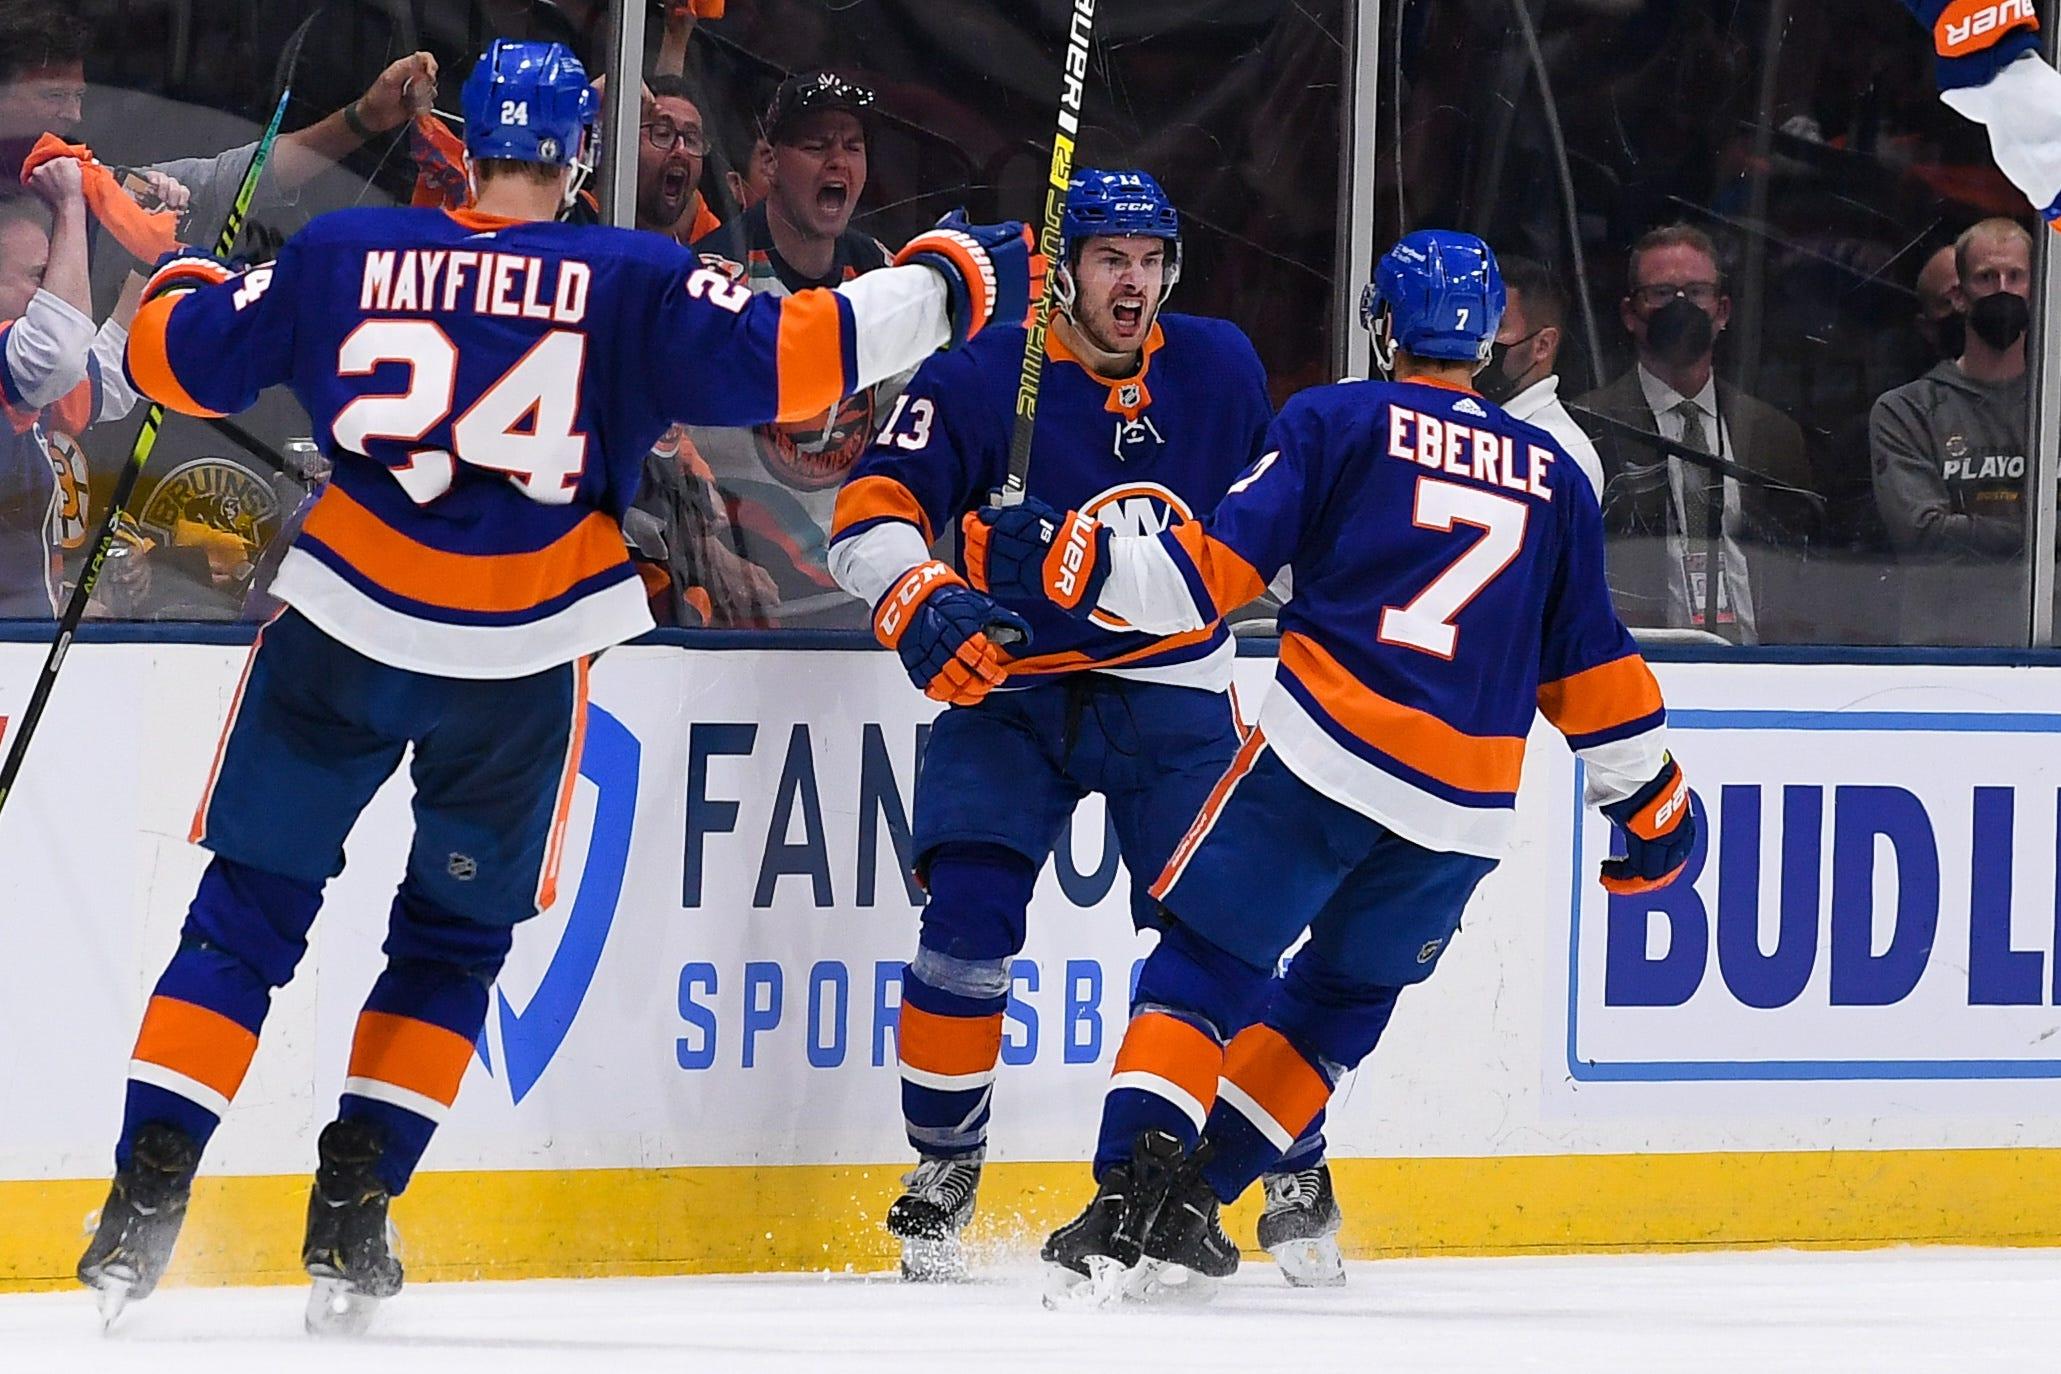 Islanders  Mathew Barzal, cheap-shotted by David Krejci earlier, scores winning goal to beat Bruins